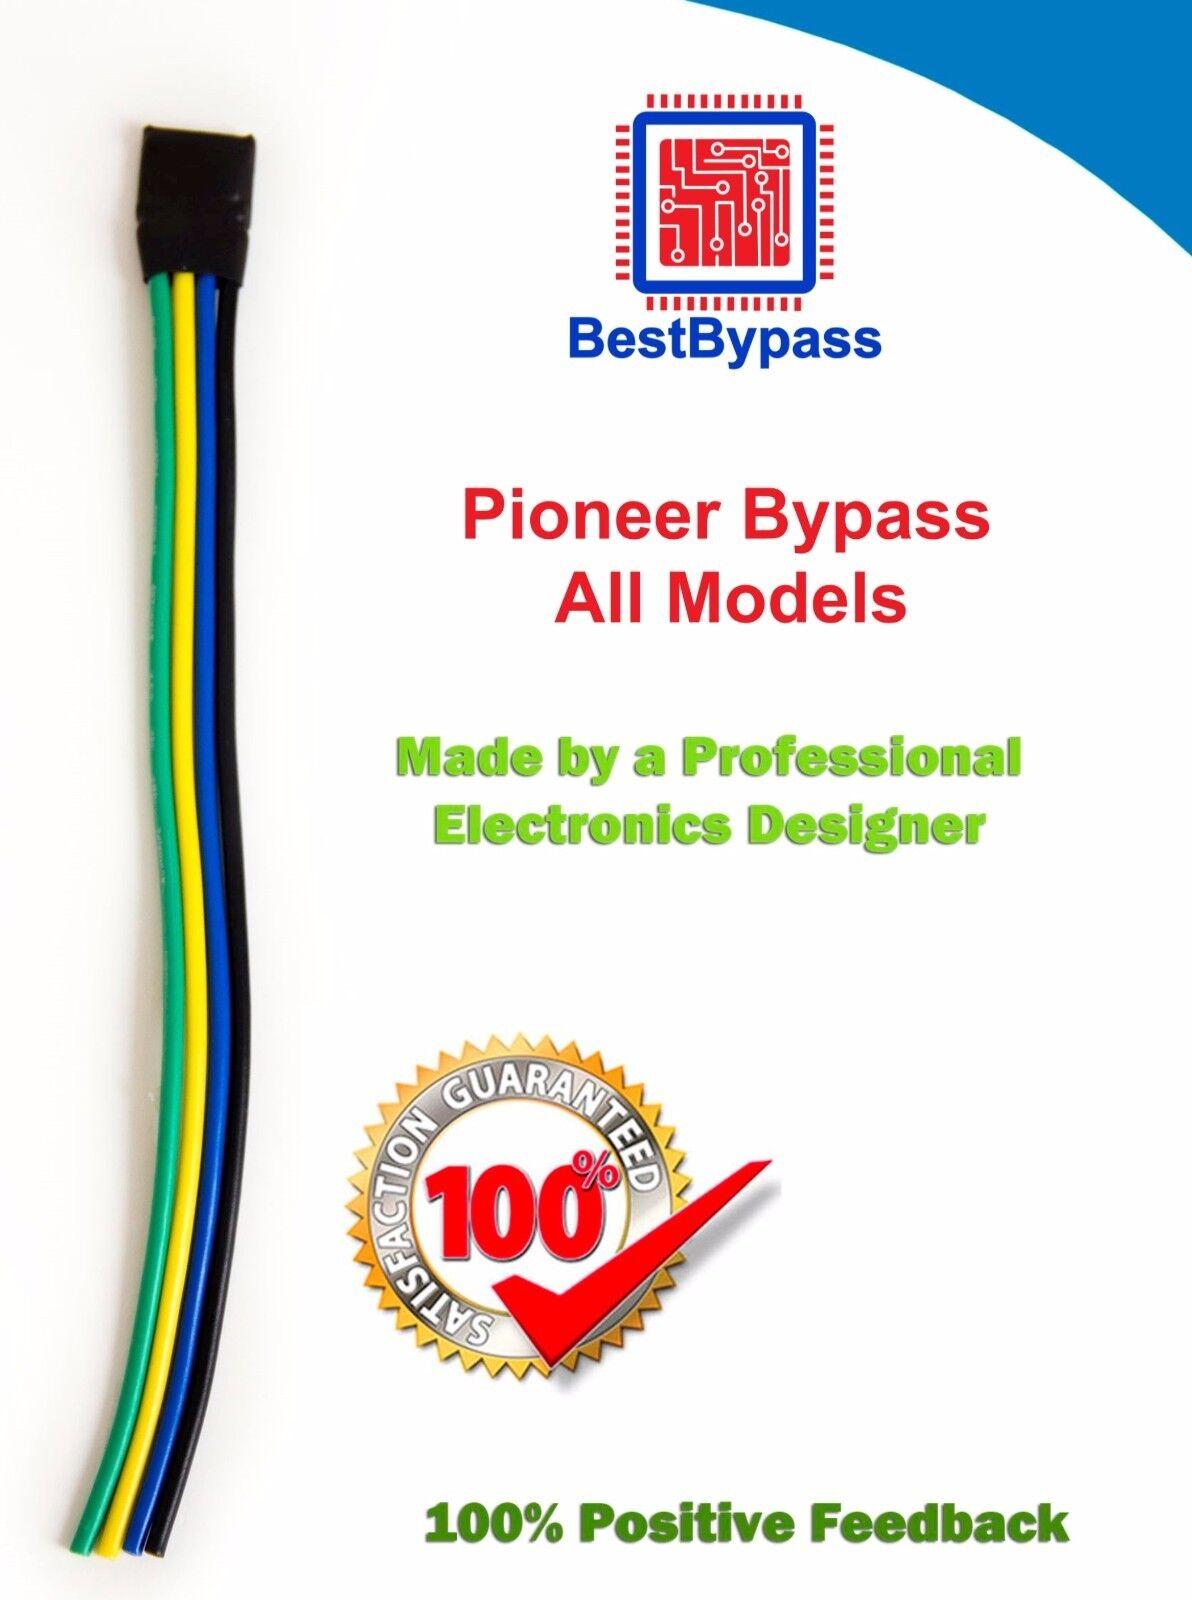 BestBypass VIDEO BYPASS, PARKING BRAKE BYPASS Triple Pulse  Fits all Pioneer AVH